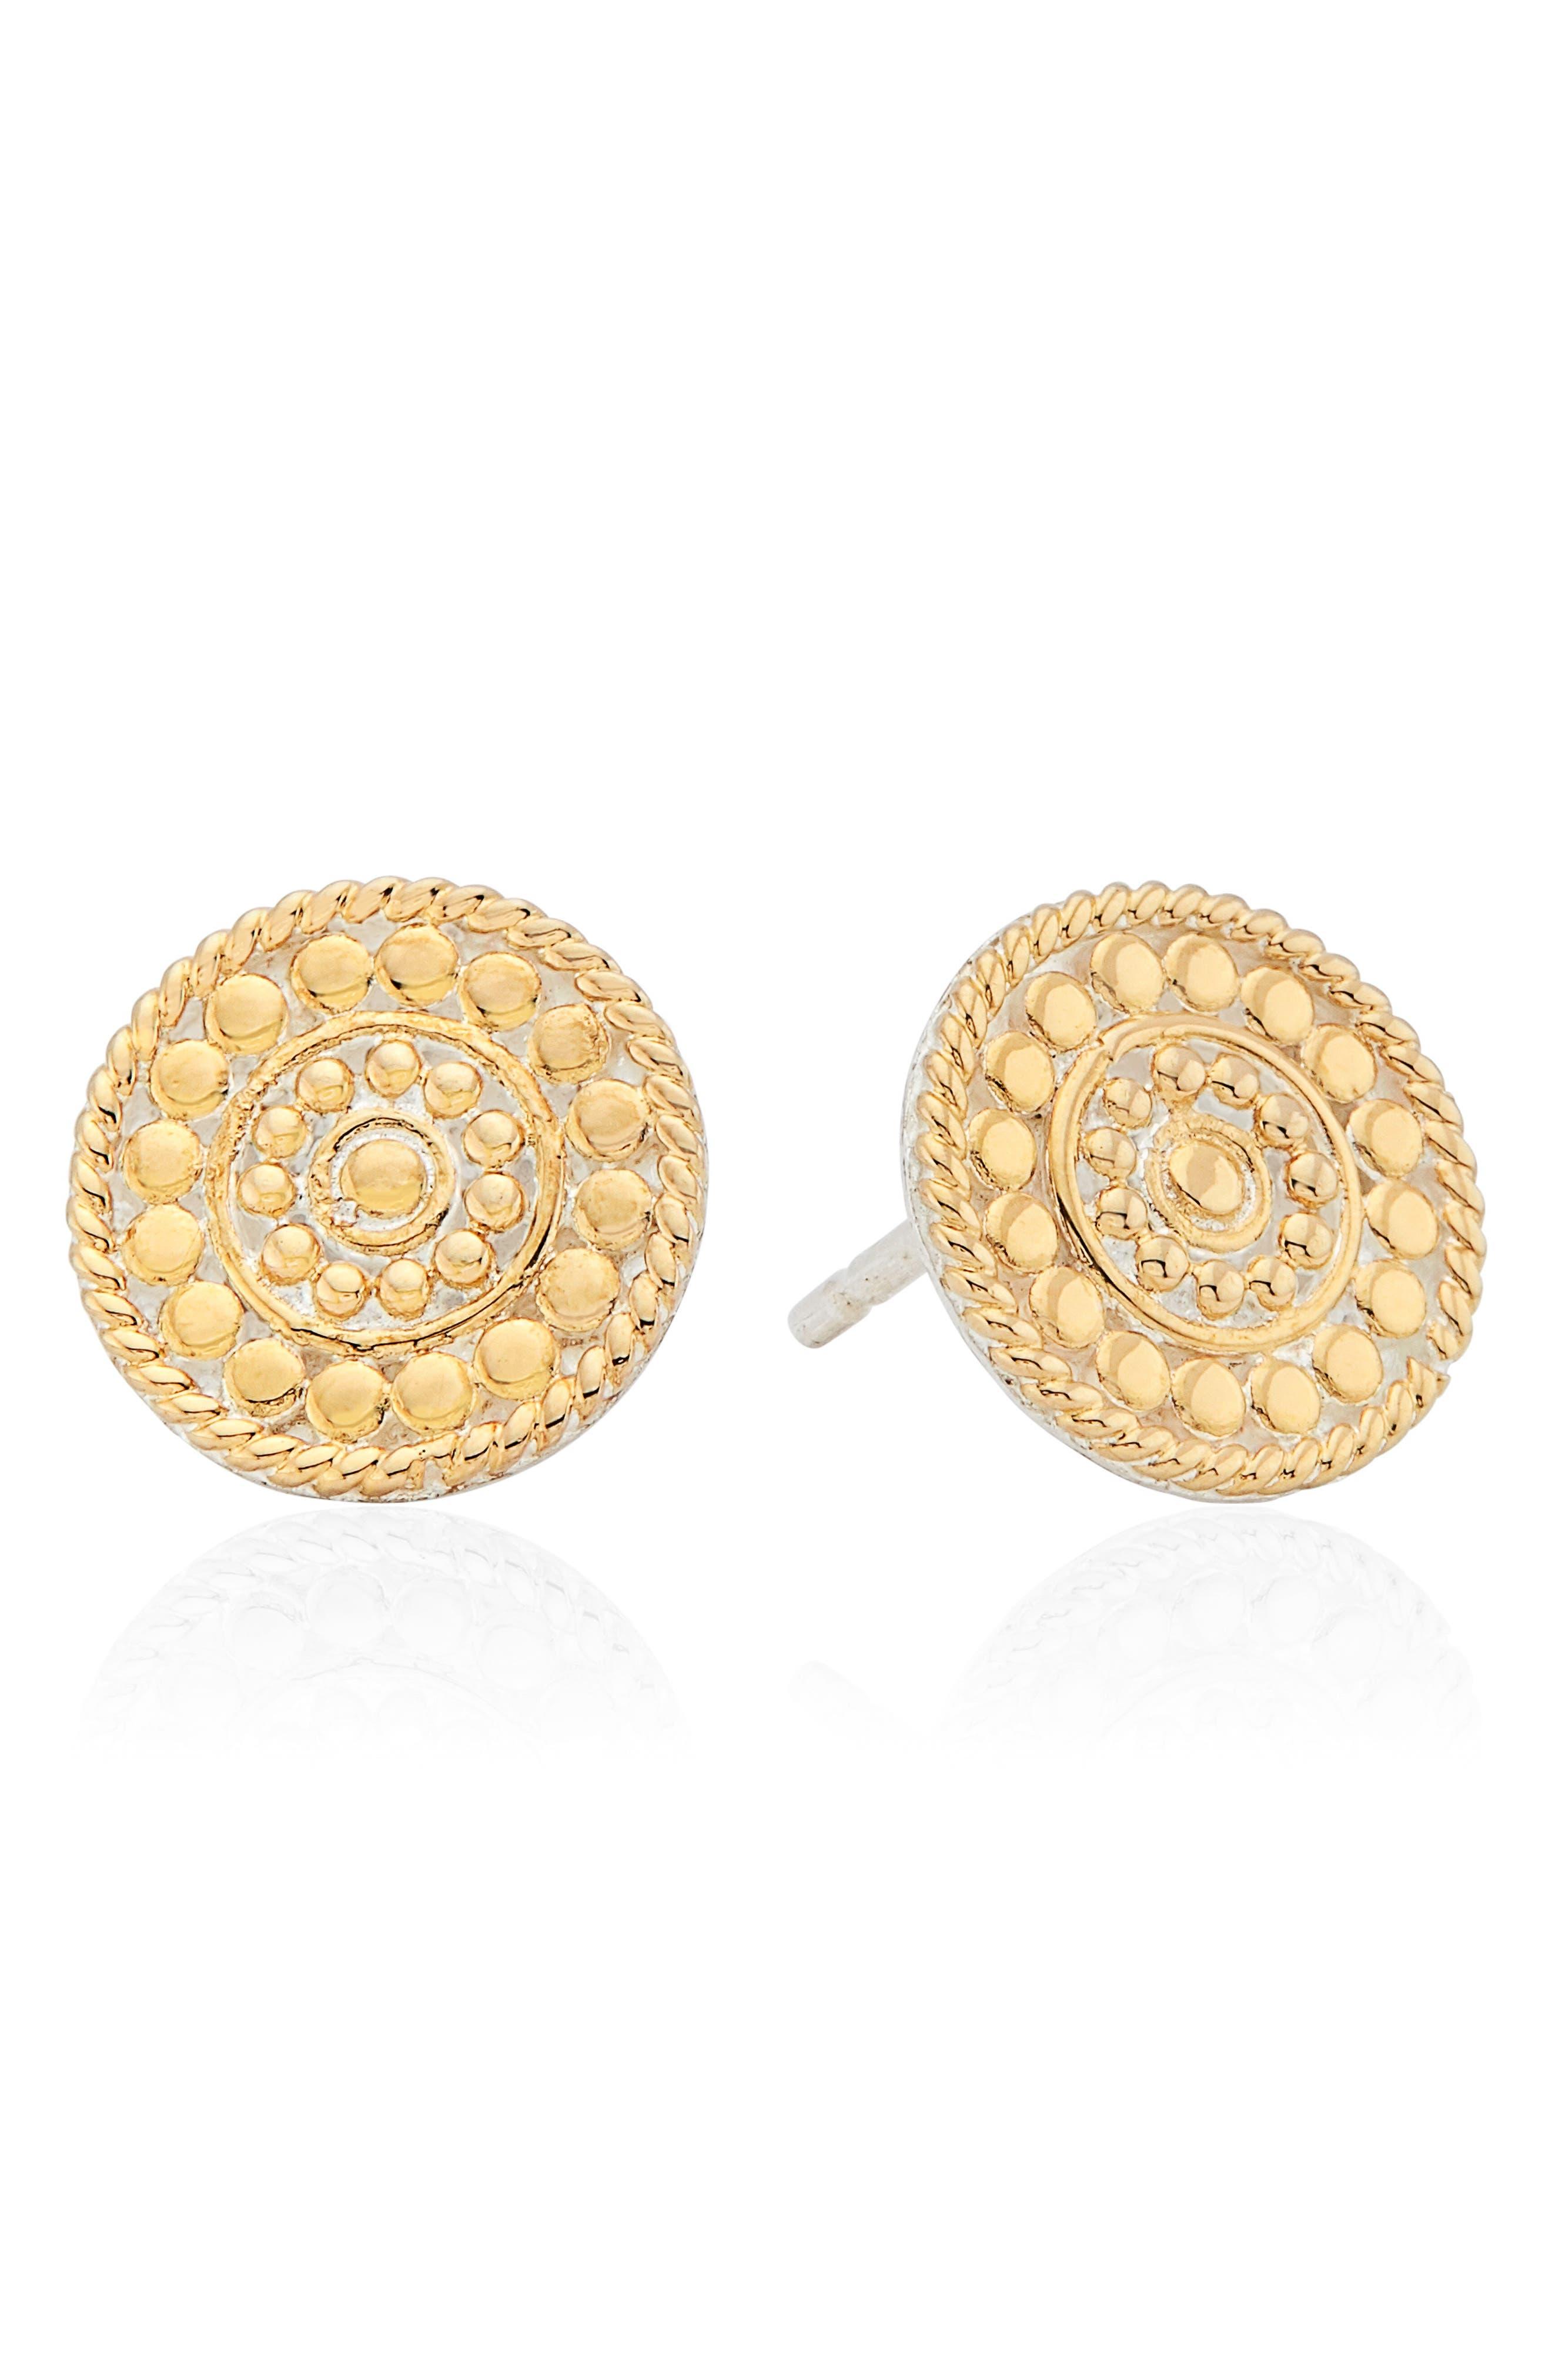 Beaded Coin Stud Earrings